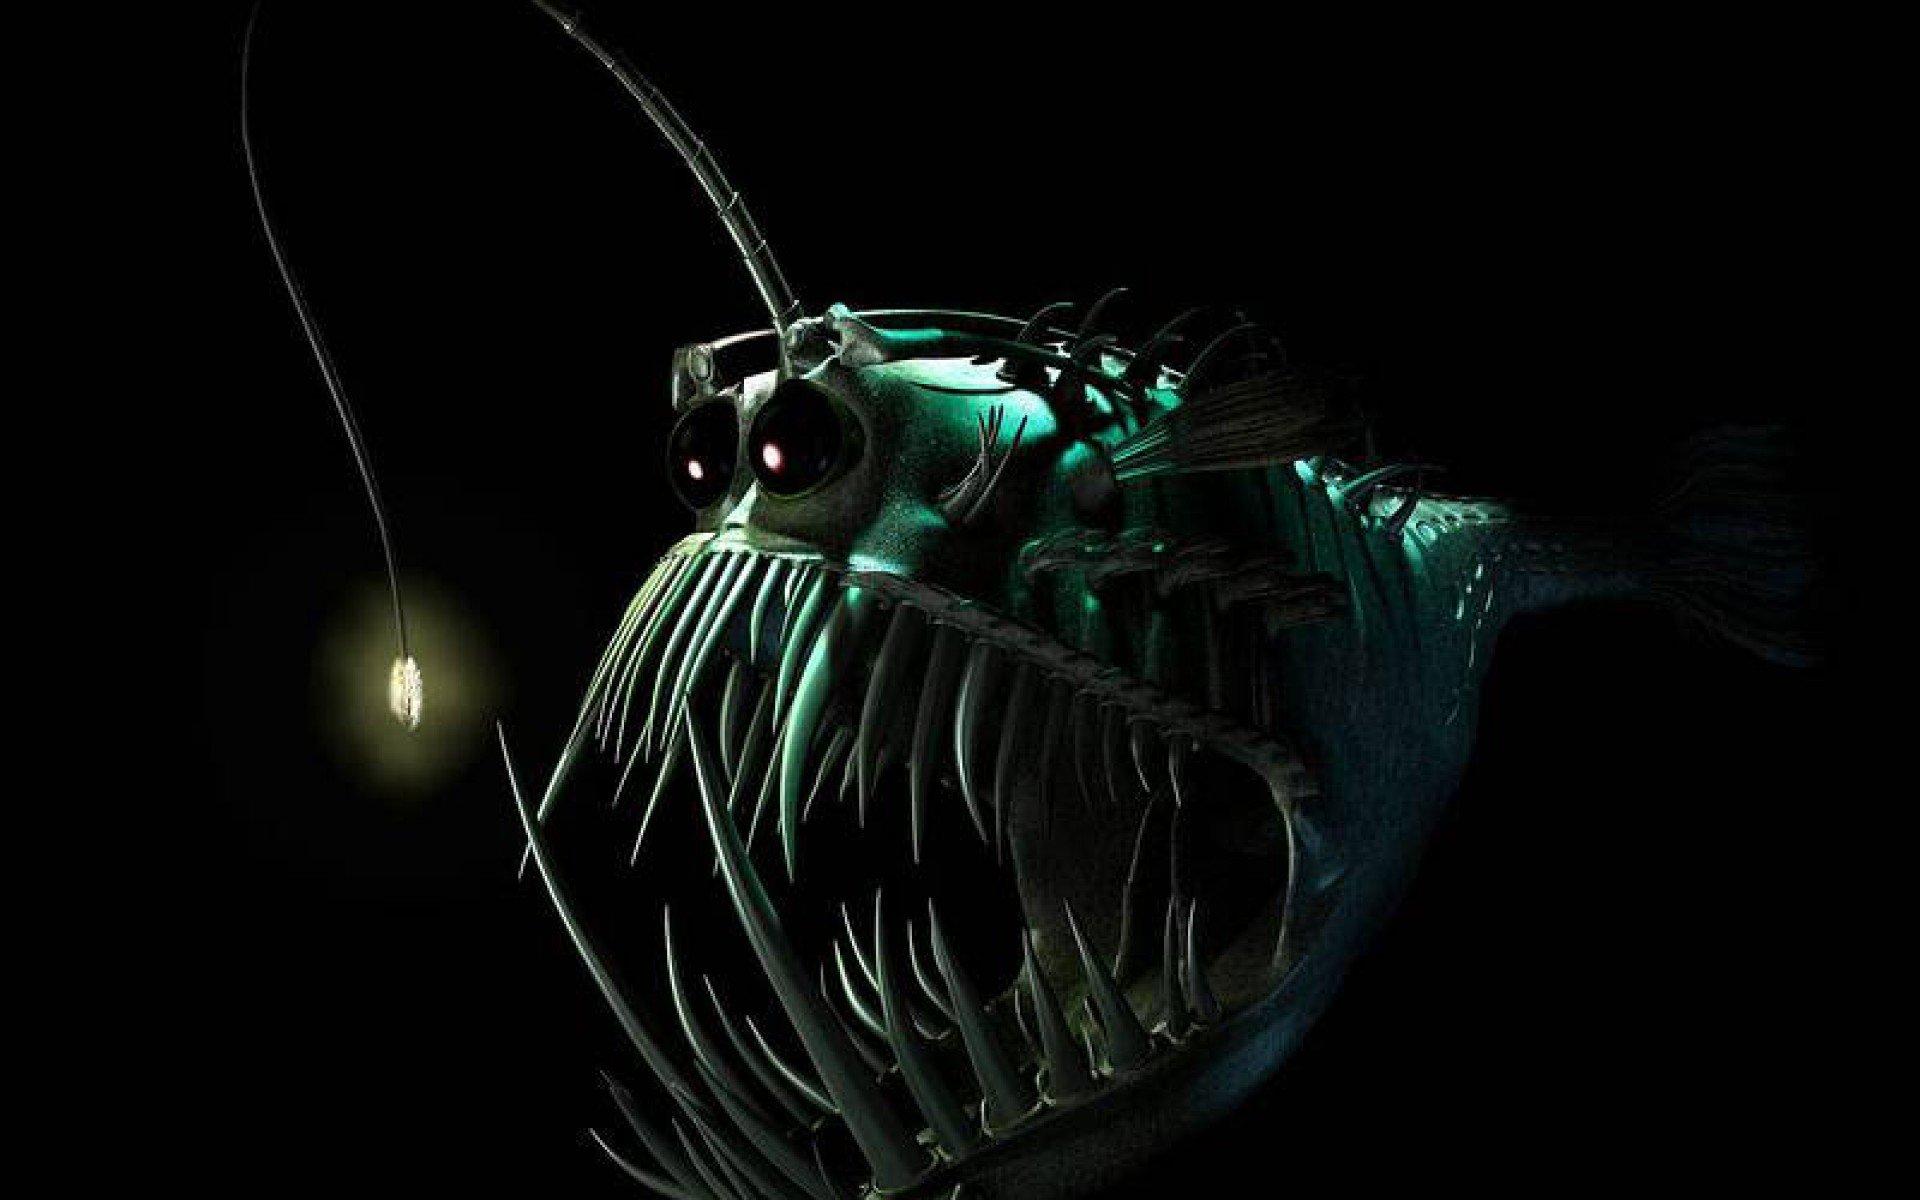 Tornado 3d Storm Live Wallpaper Anglerfish Fish Ocean Sea Underwater Dark Creepy Monster